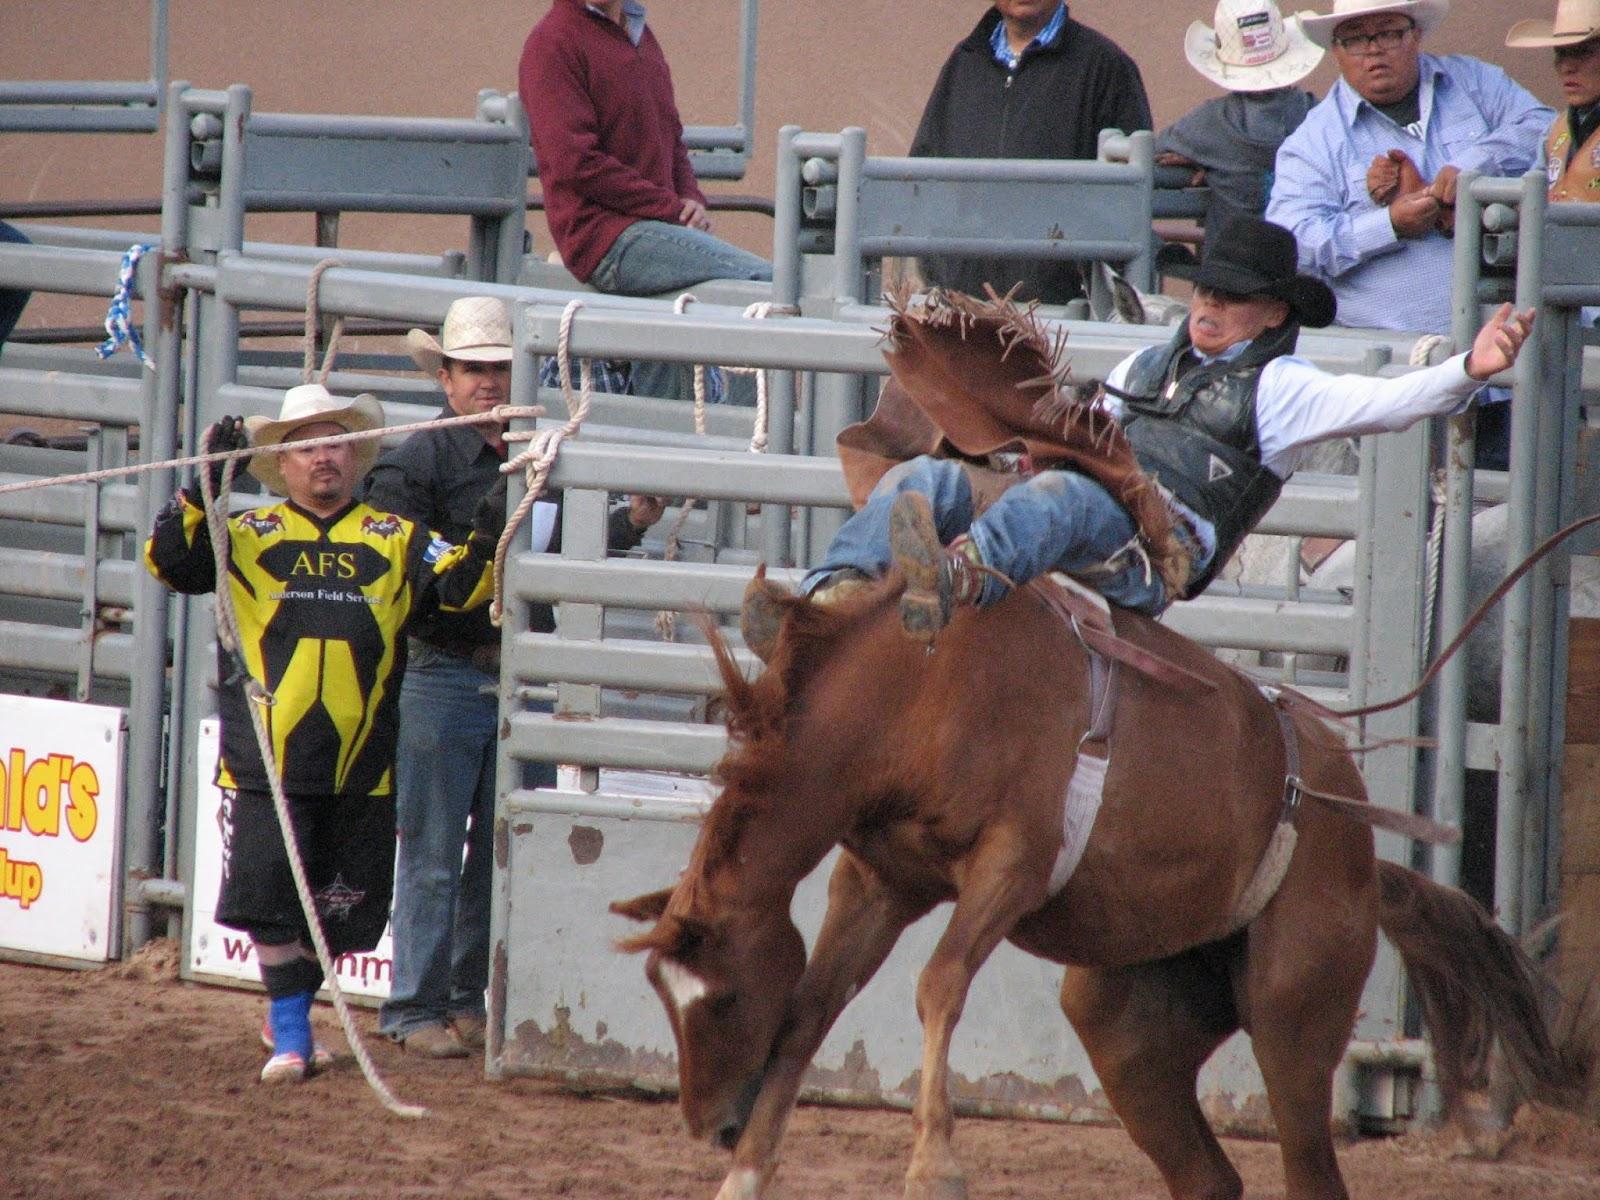 Armand S Rancho Del Cielo 71st Annual Gallup Lions Club Rodeo